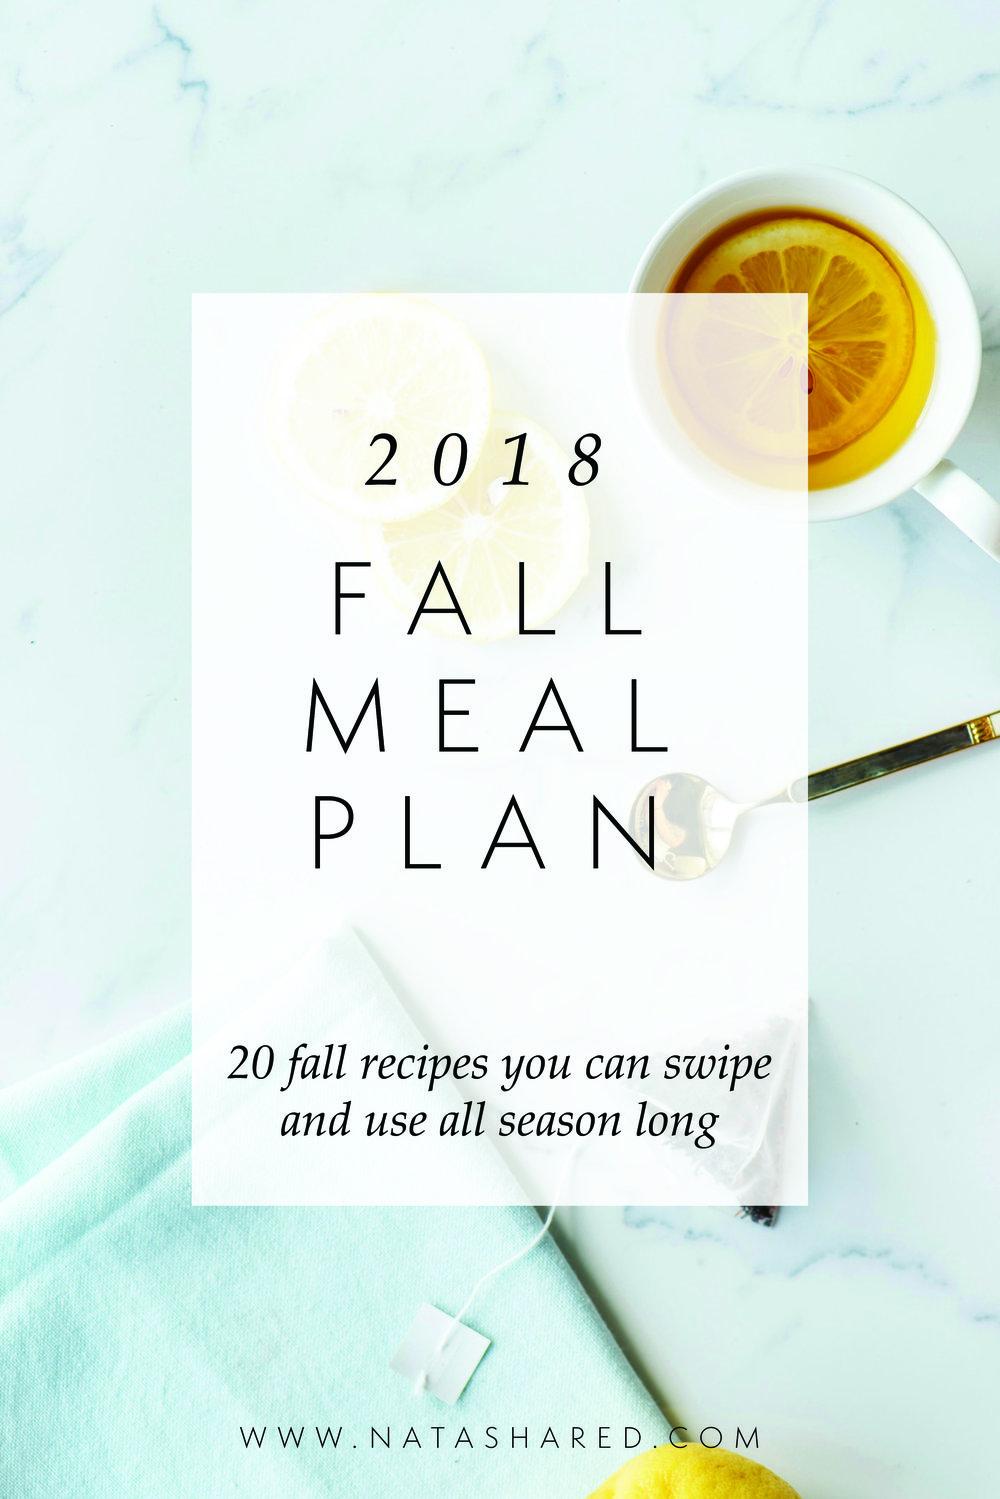 2018 Fall Meal Plan | Natasha Red | Seasonal Meal Planner | Fall Recipes | 20 Fall Recipes to Use all Season